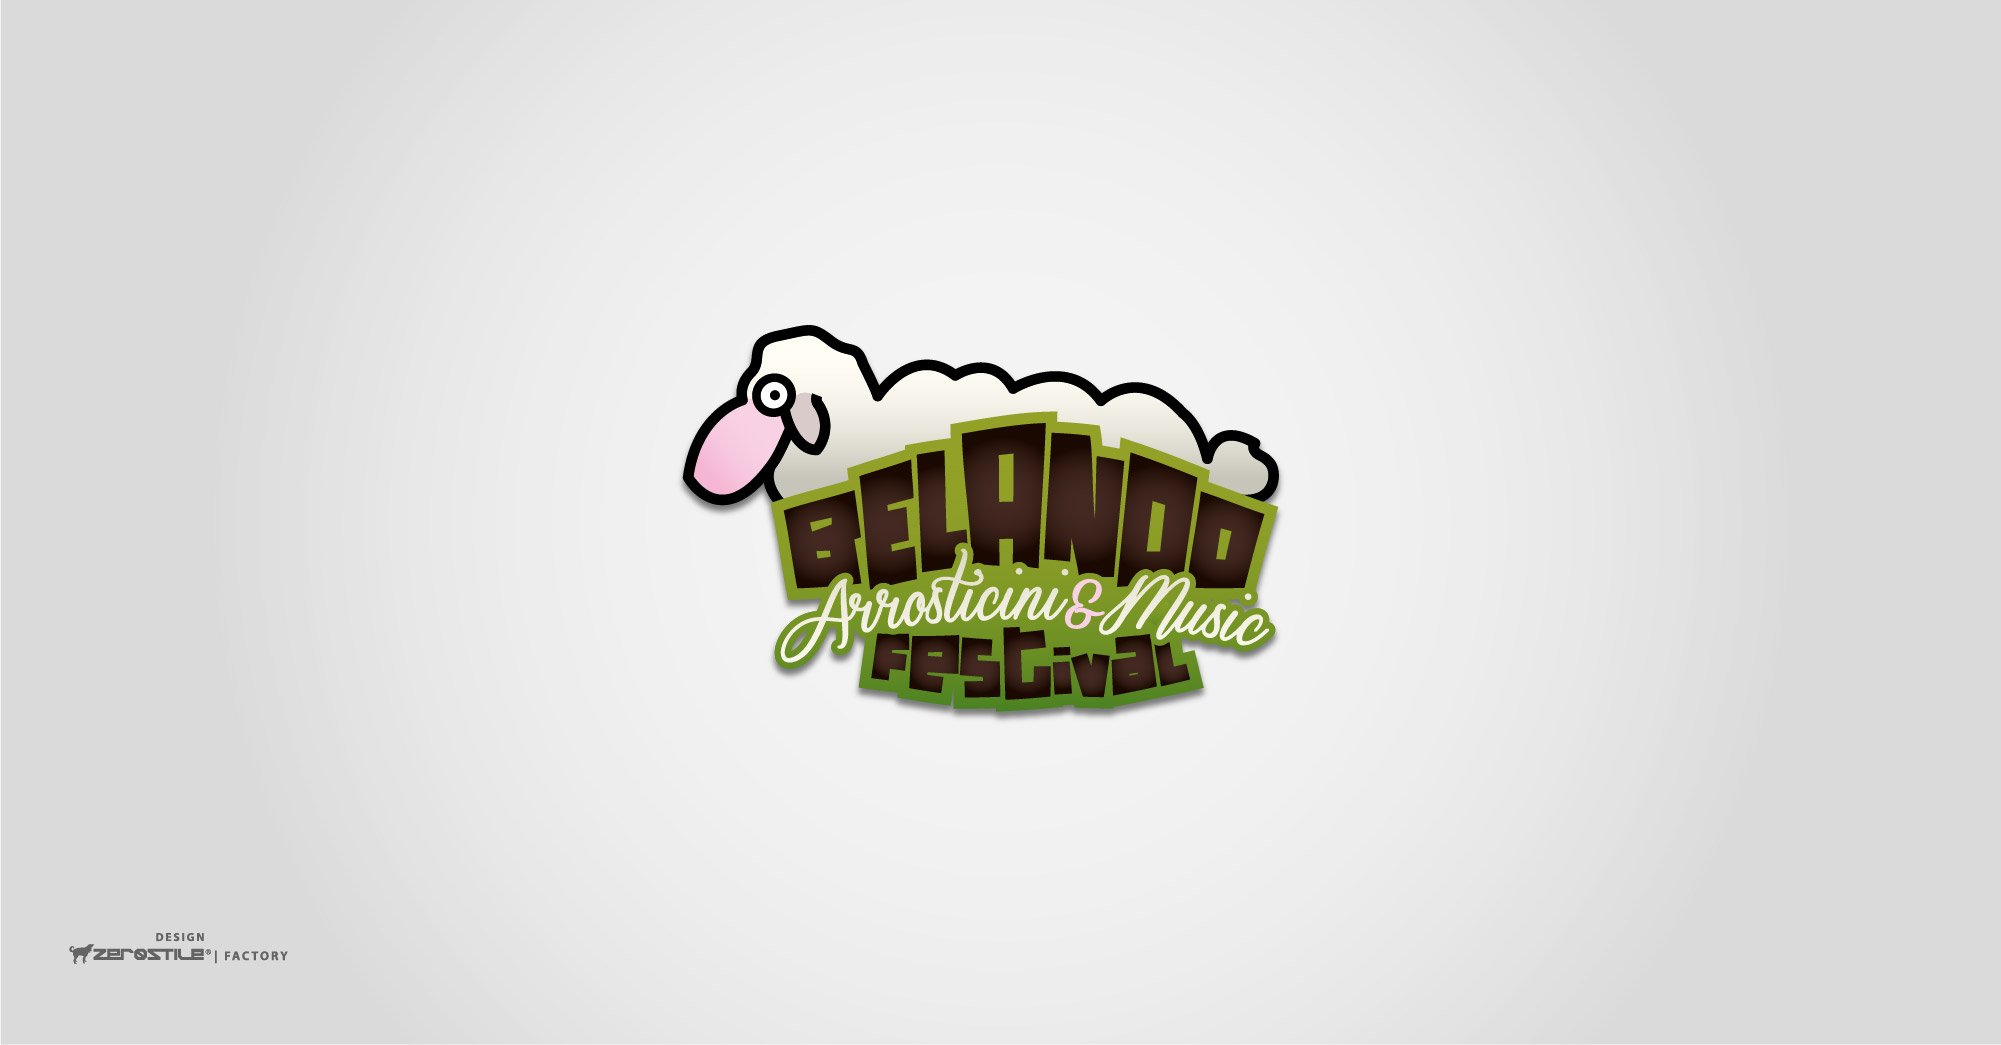 Logo_belando_Porfolio Gallery_Porfolio Gallery_Porfolio Gallery